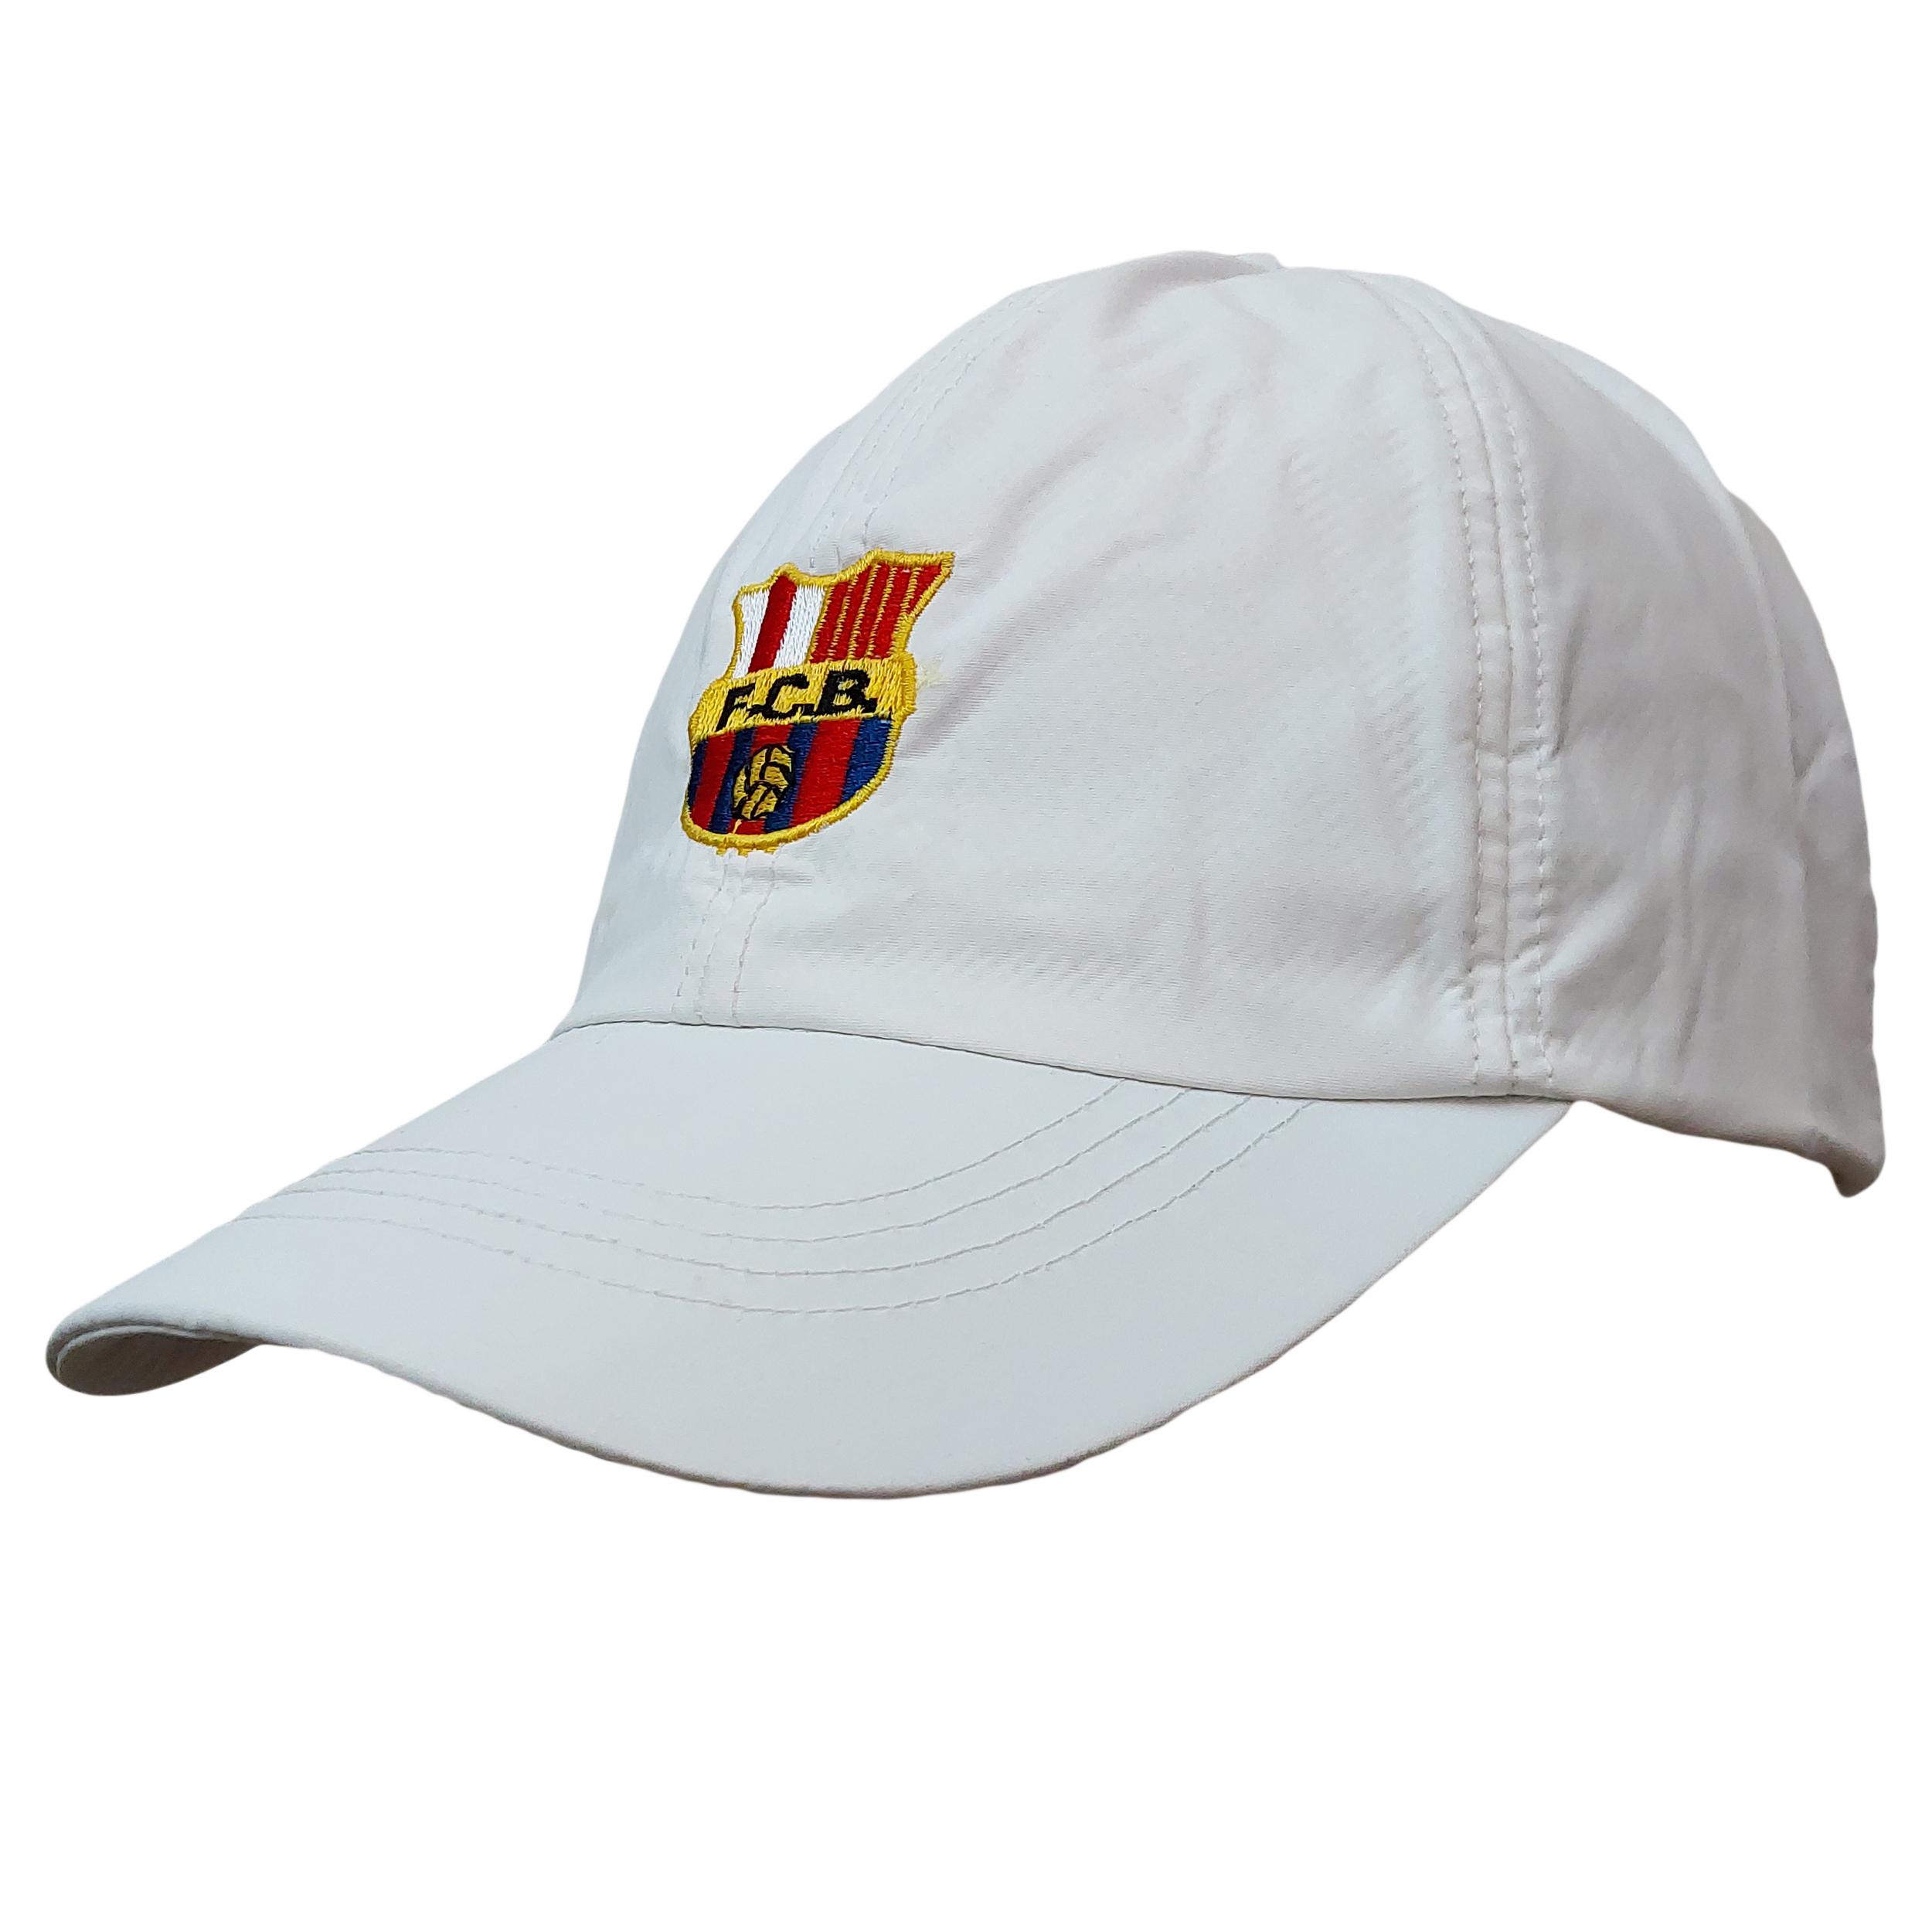 کلاه کپ طرح بارسلونا کد H-31-04